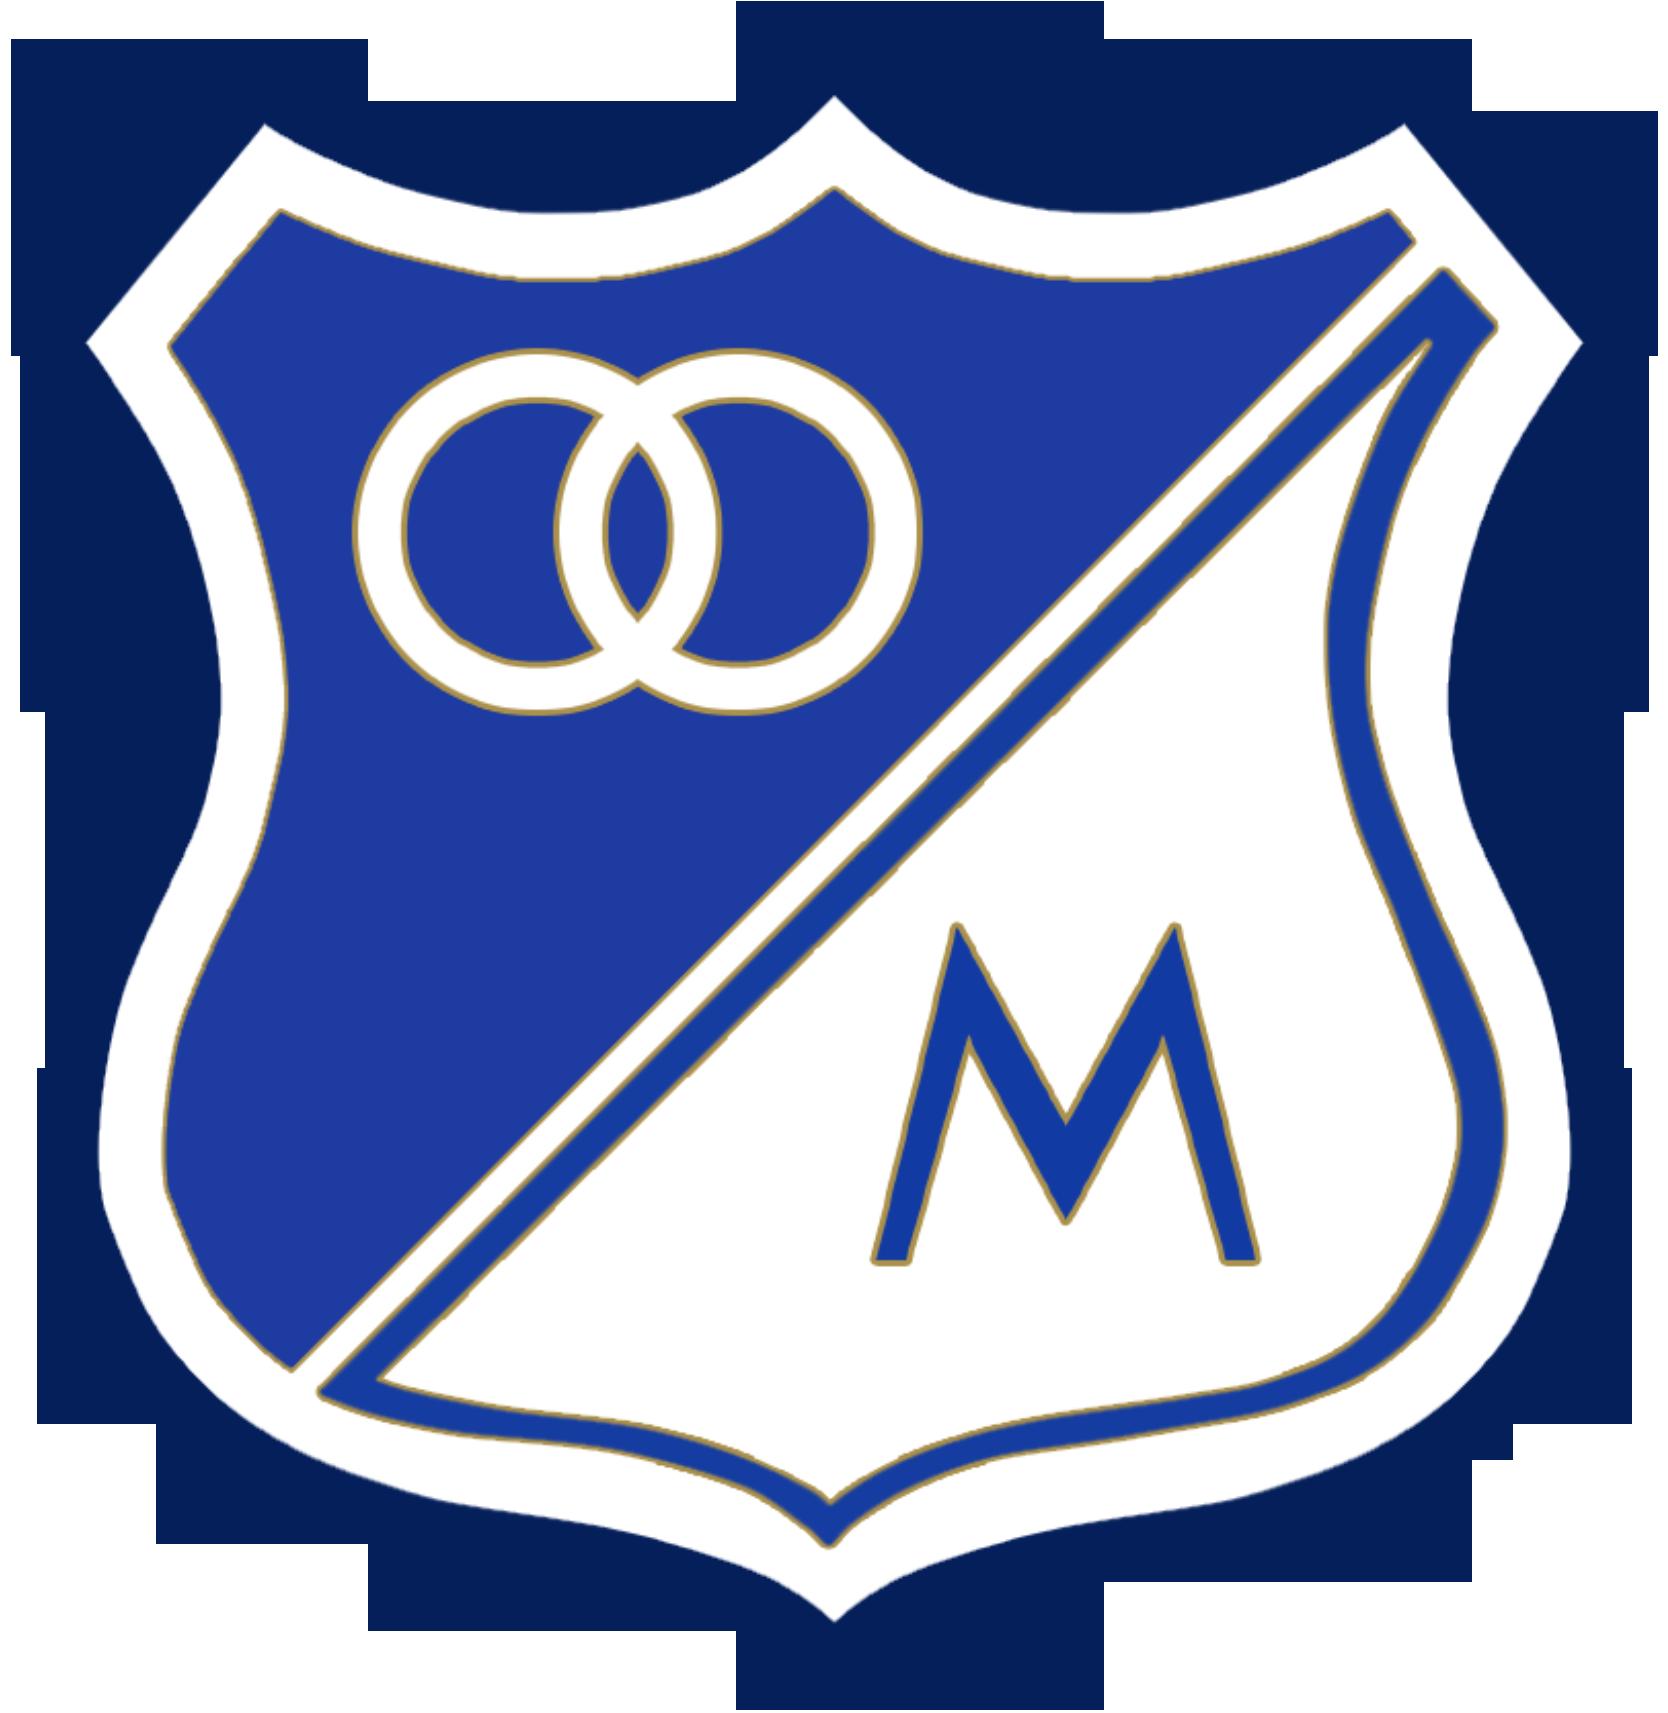 Millonarios W logo